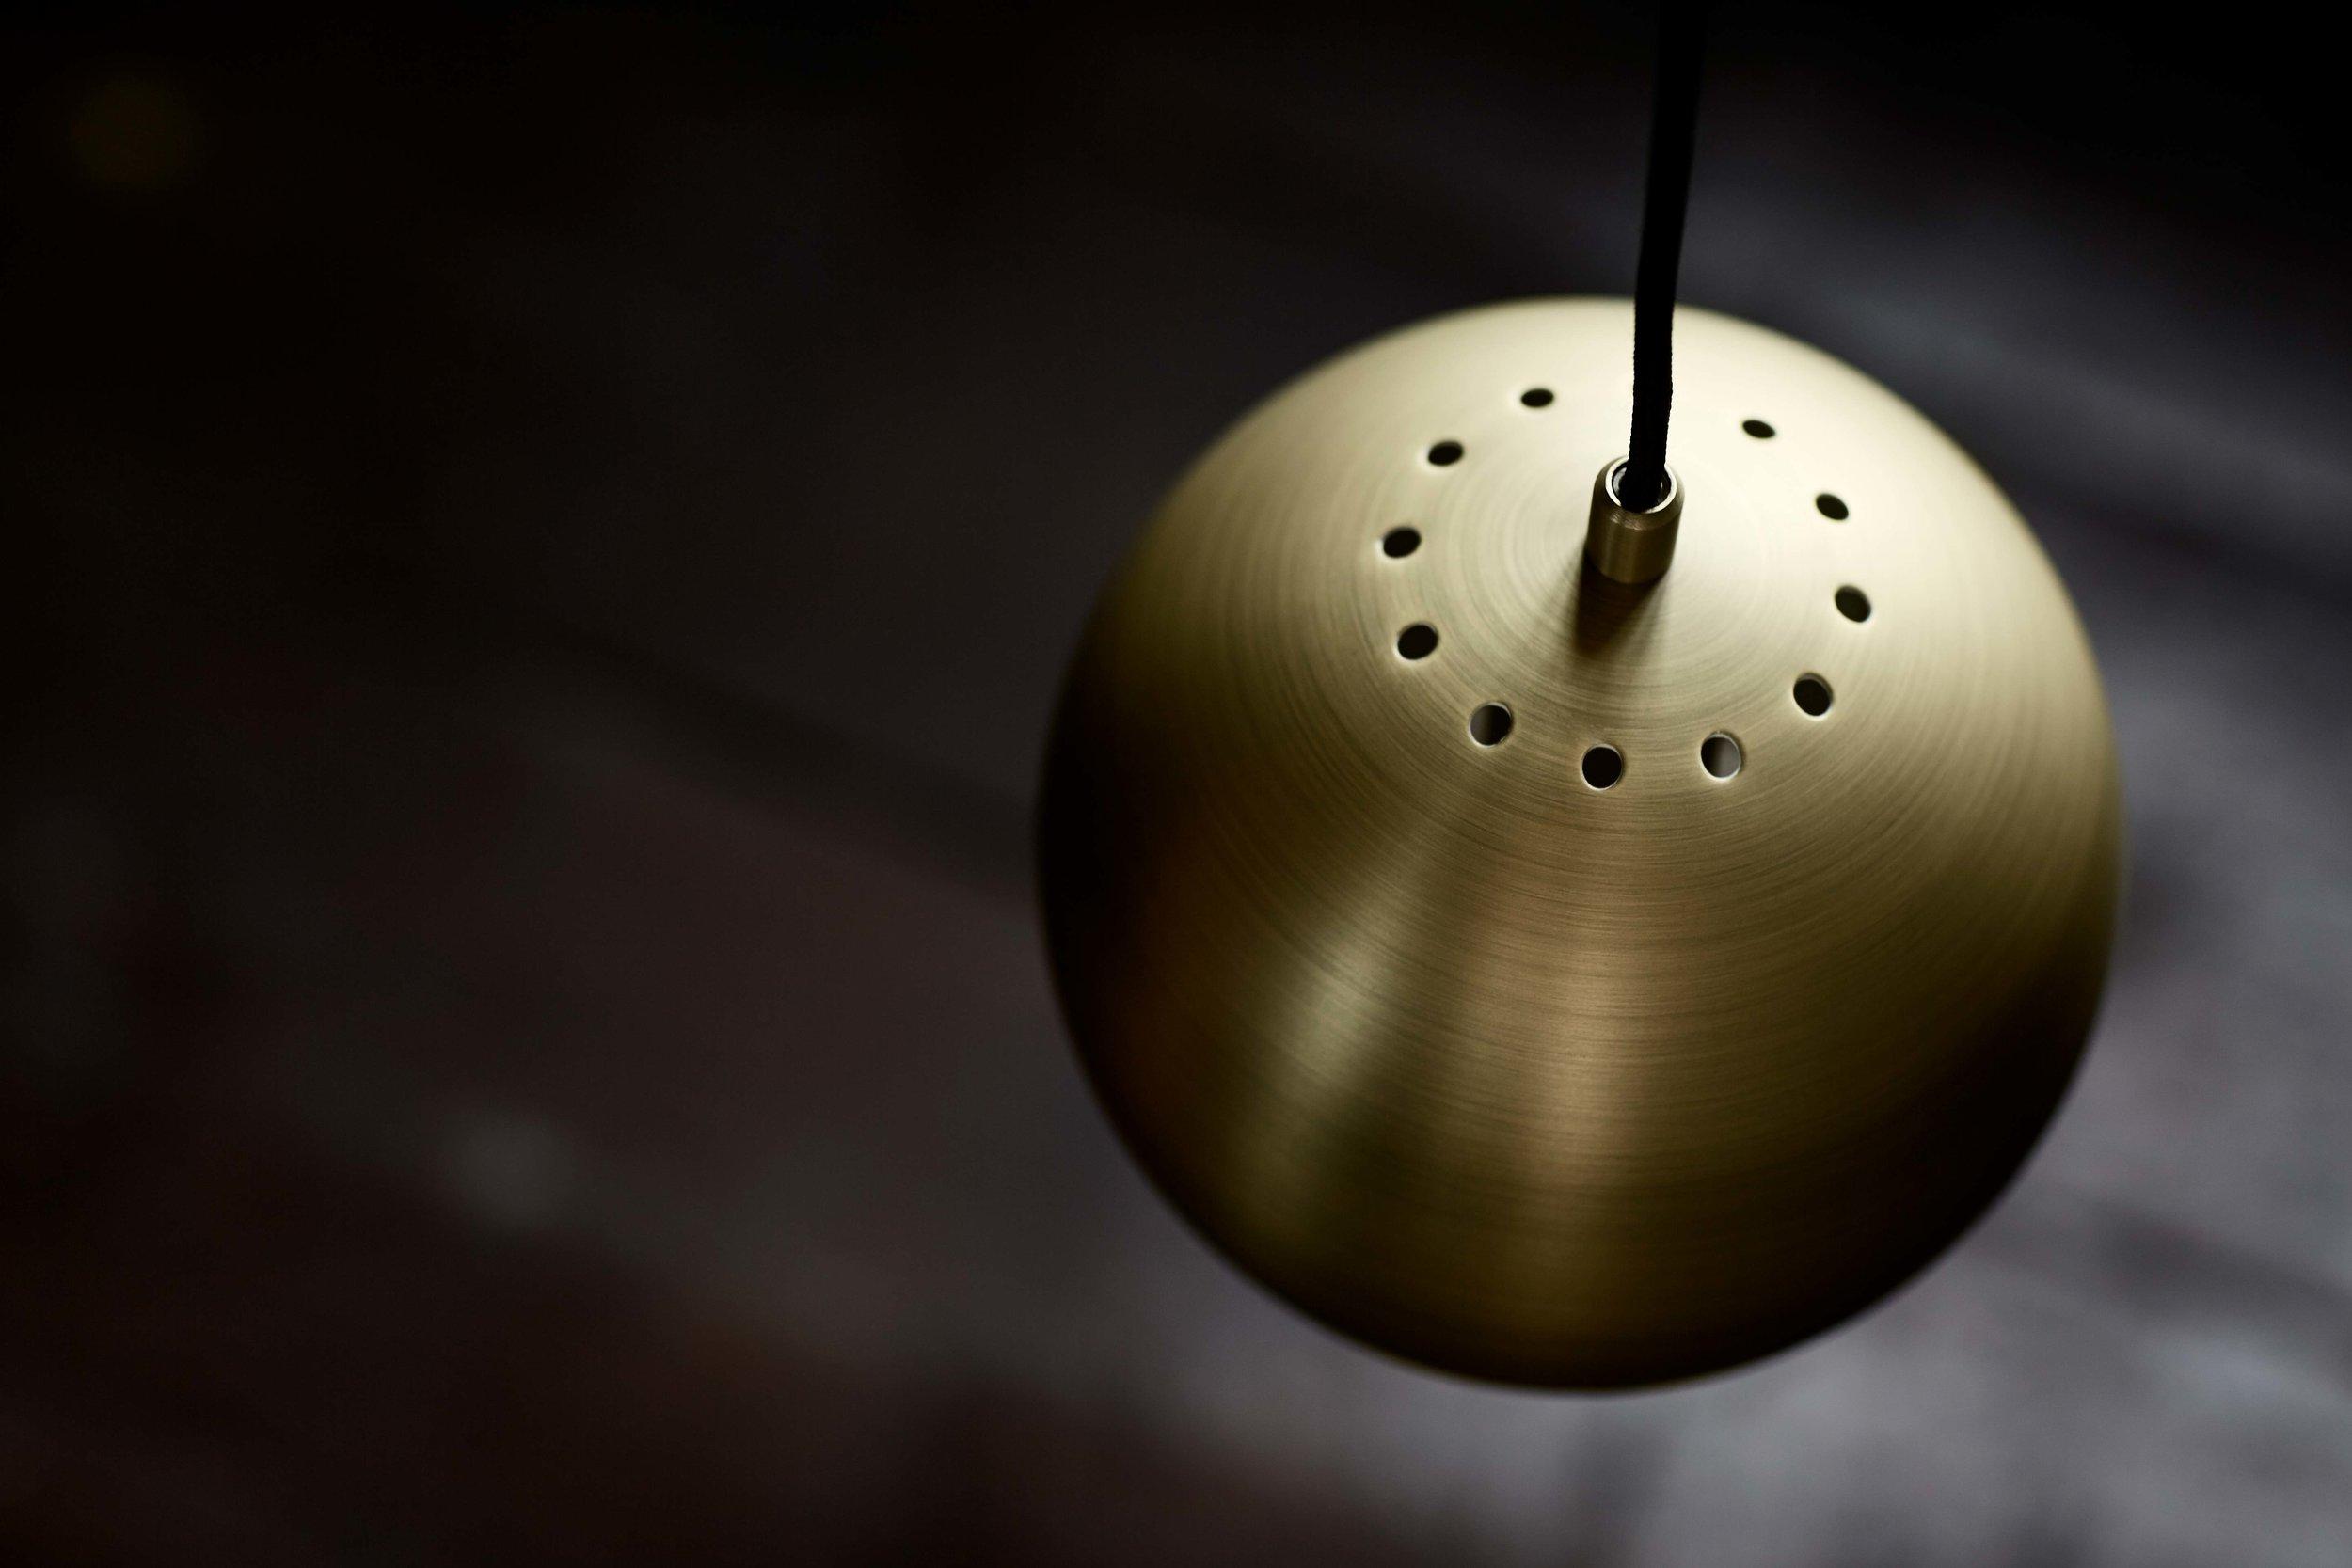 Ball-pendant-18-cm-antique-brass---Lifestyle-closeup-Randers-1115.jpg